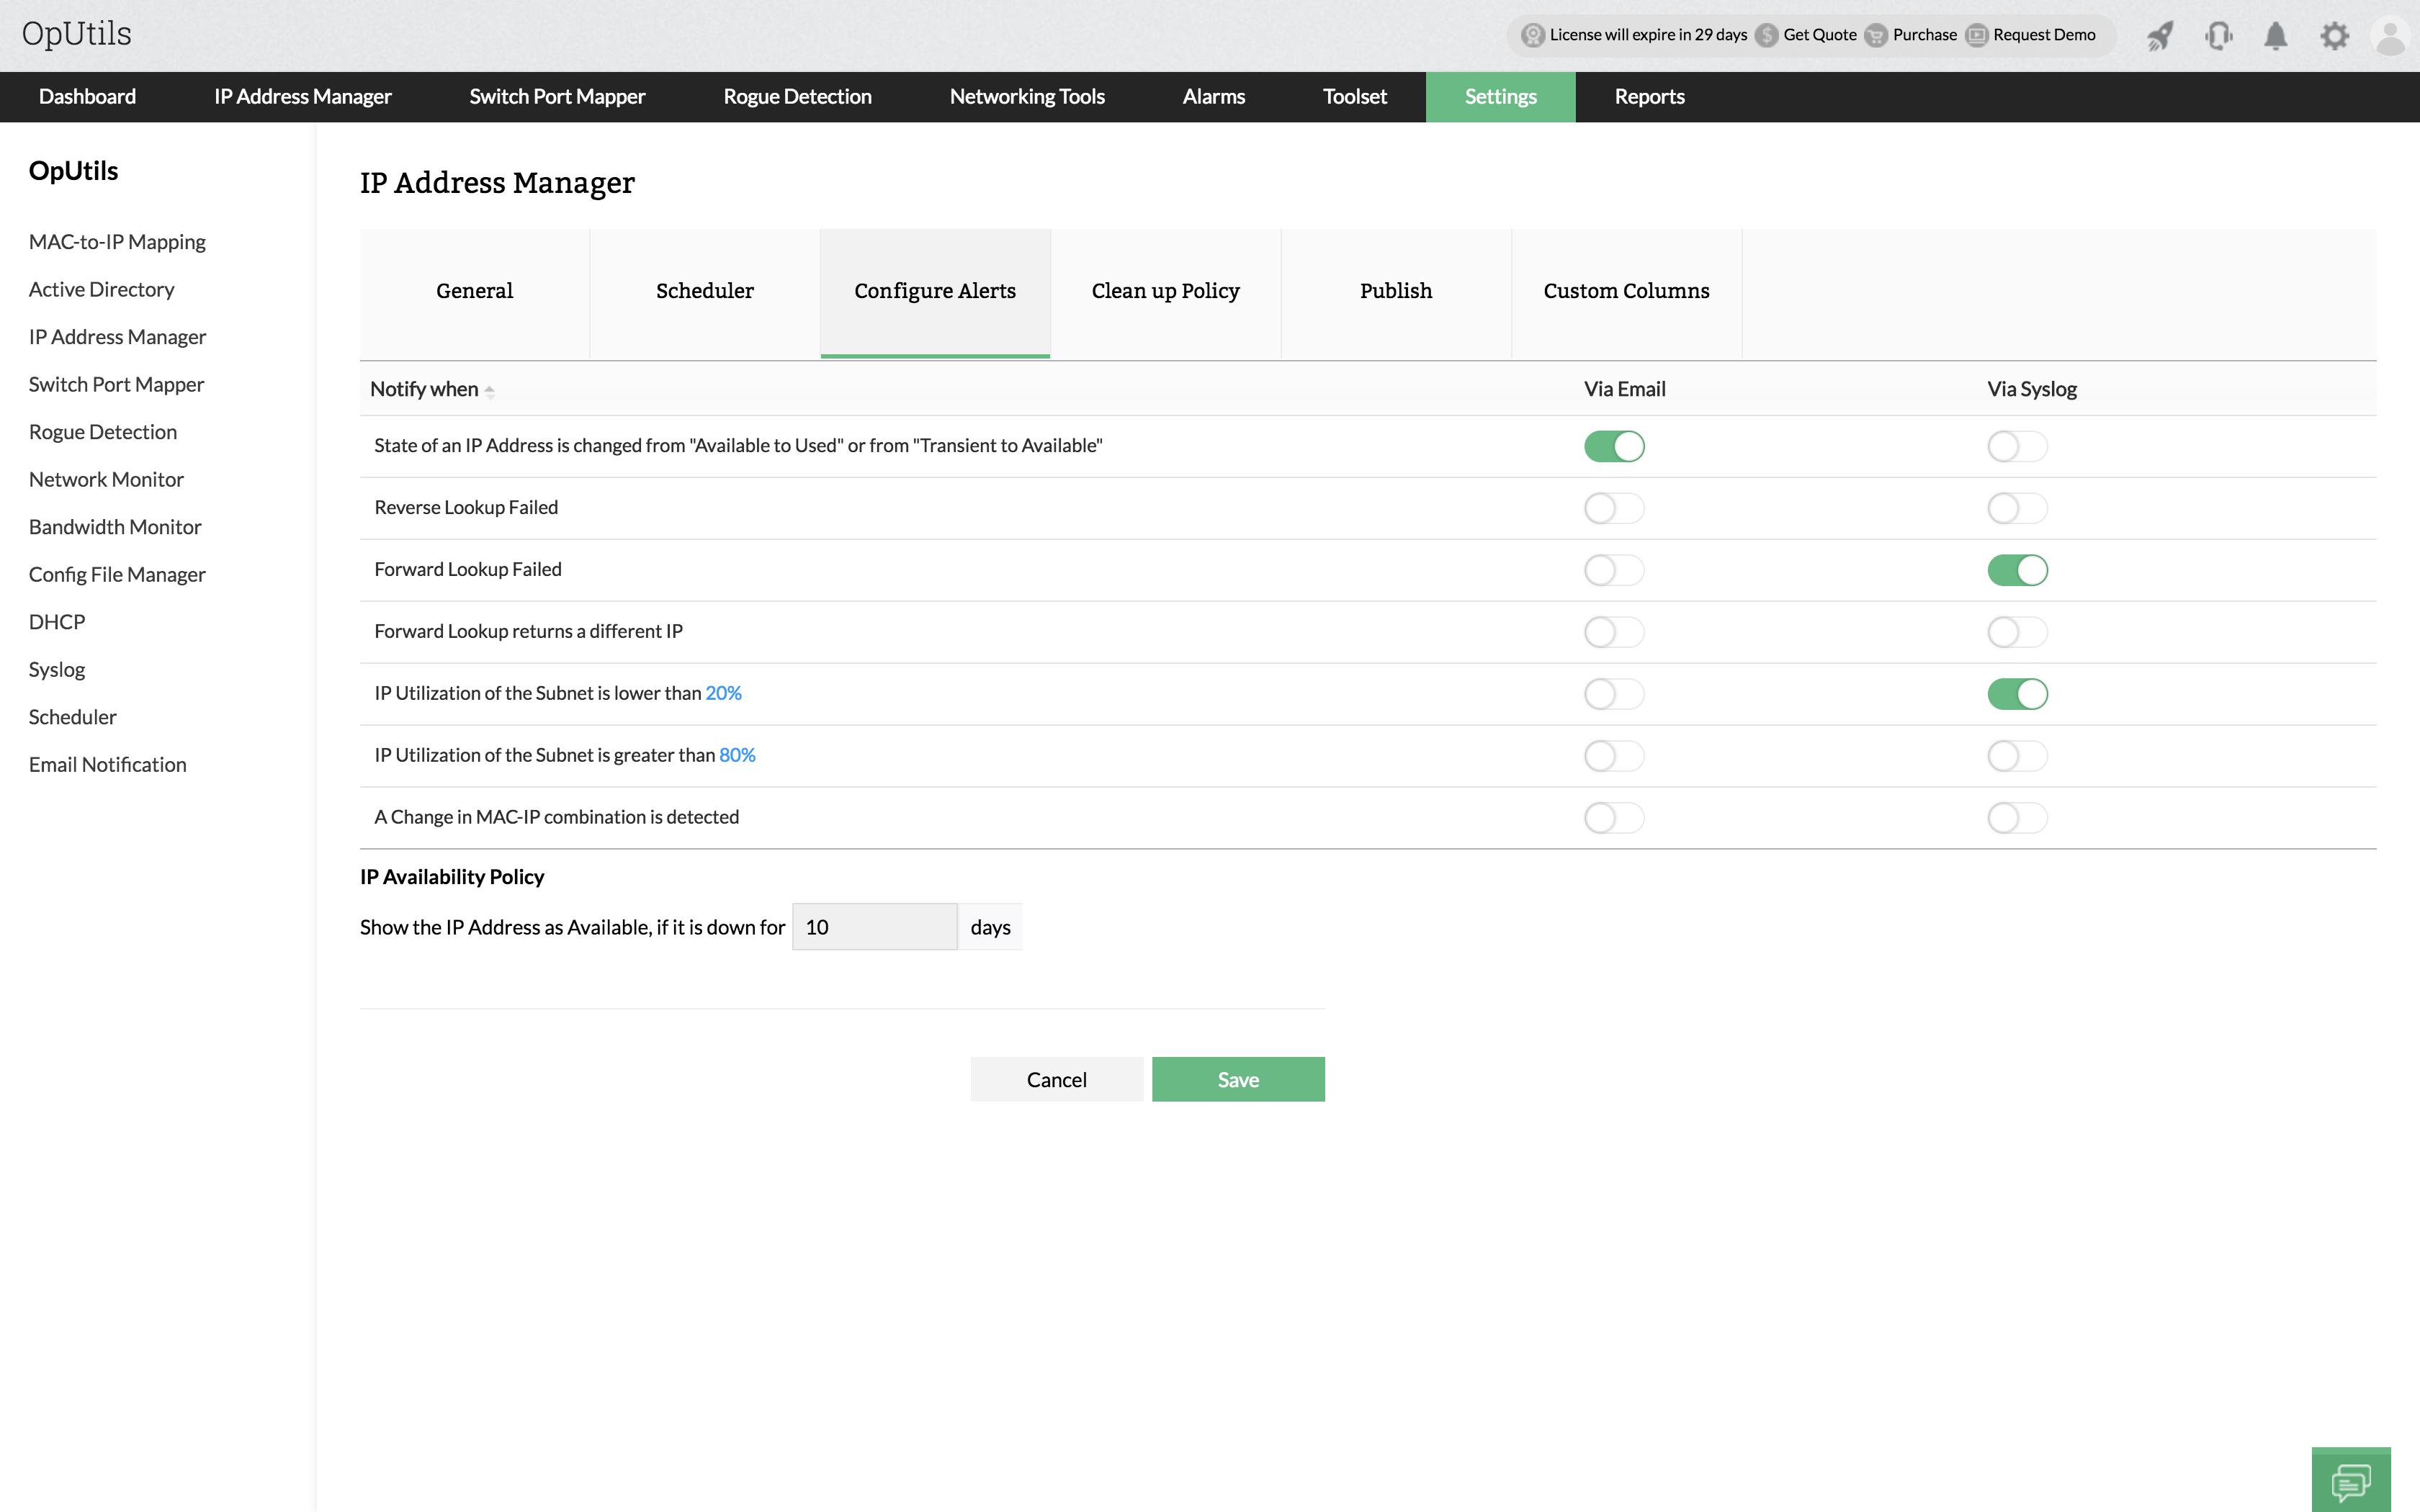 Web Based IP Address Management - ManageEngine Oputils